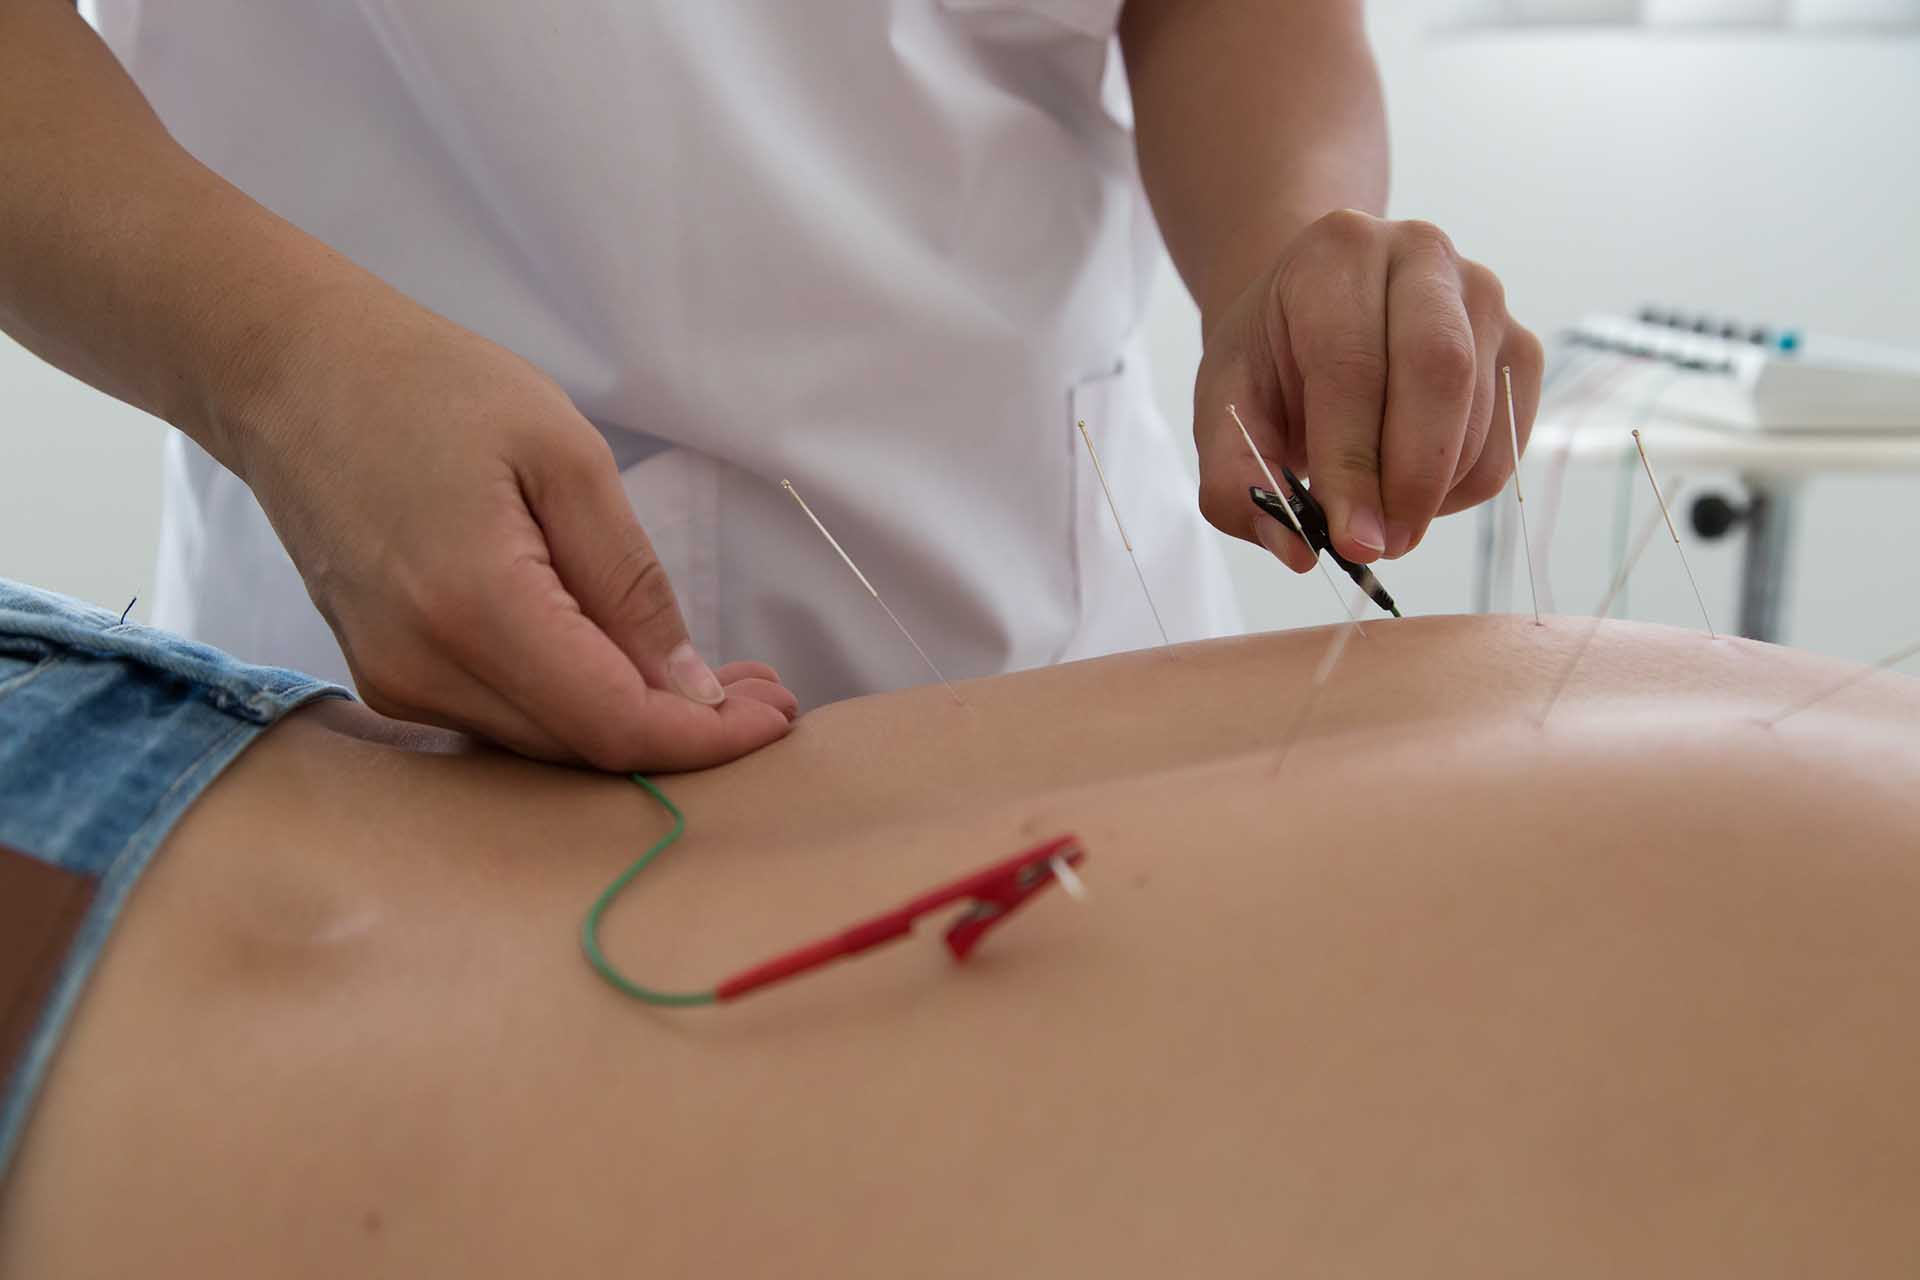 Toumazi Physio Gallery - Electro acupuncture